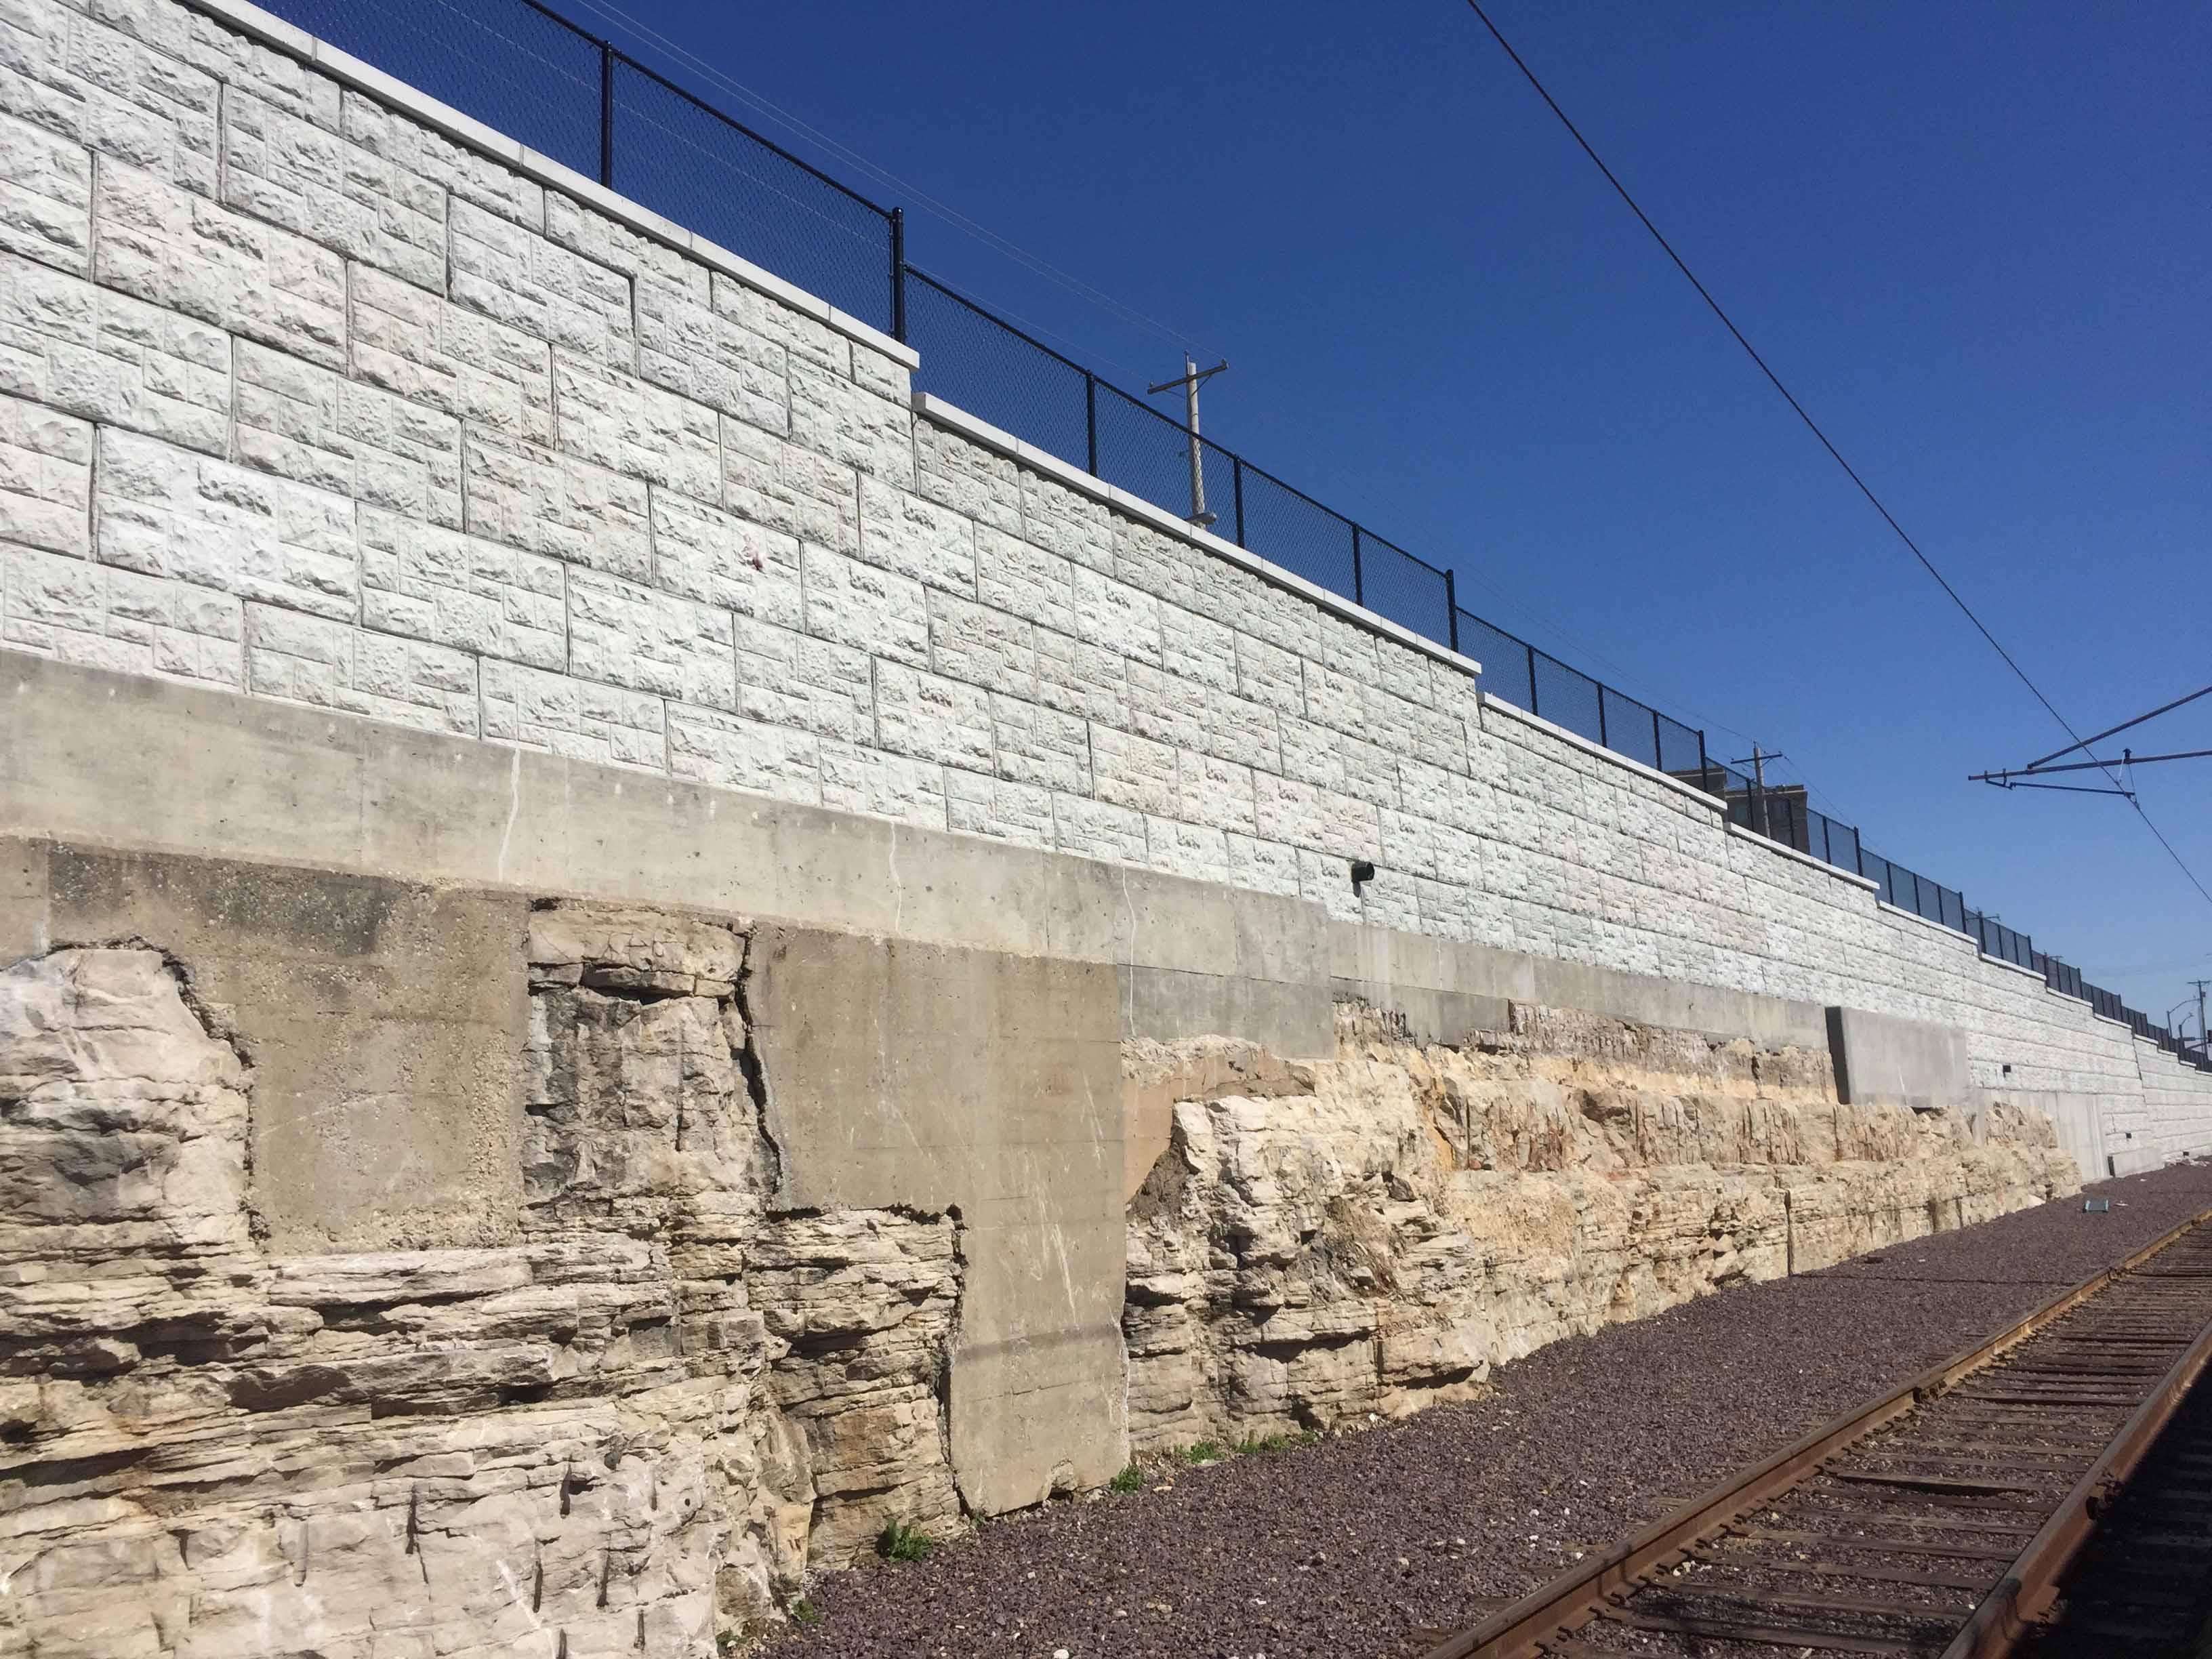 MaxumStone castle face retaining walls in st louis missouri